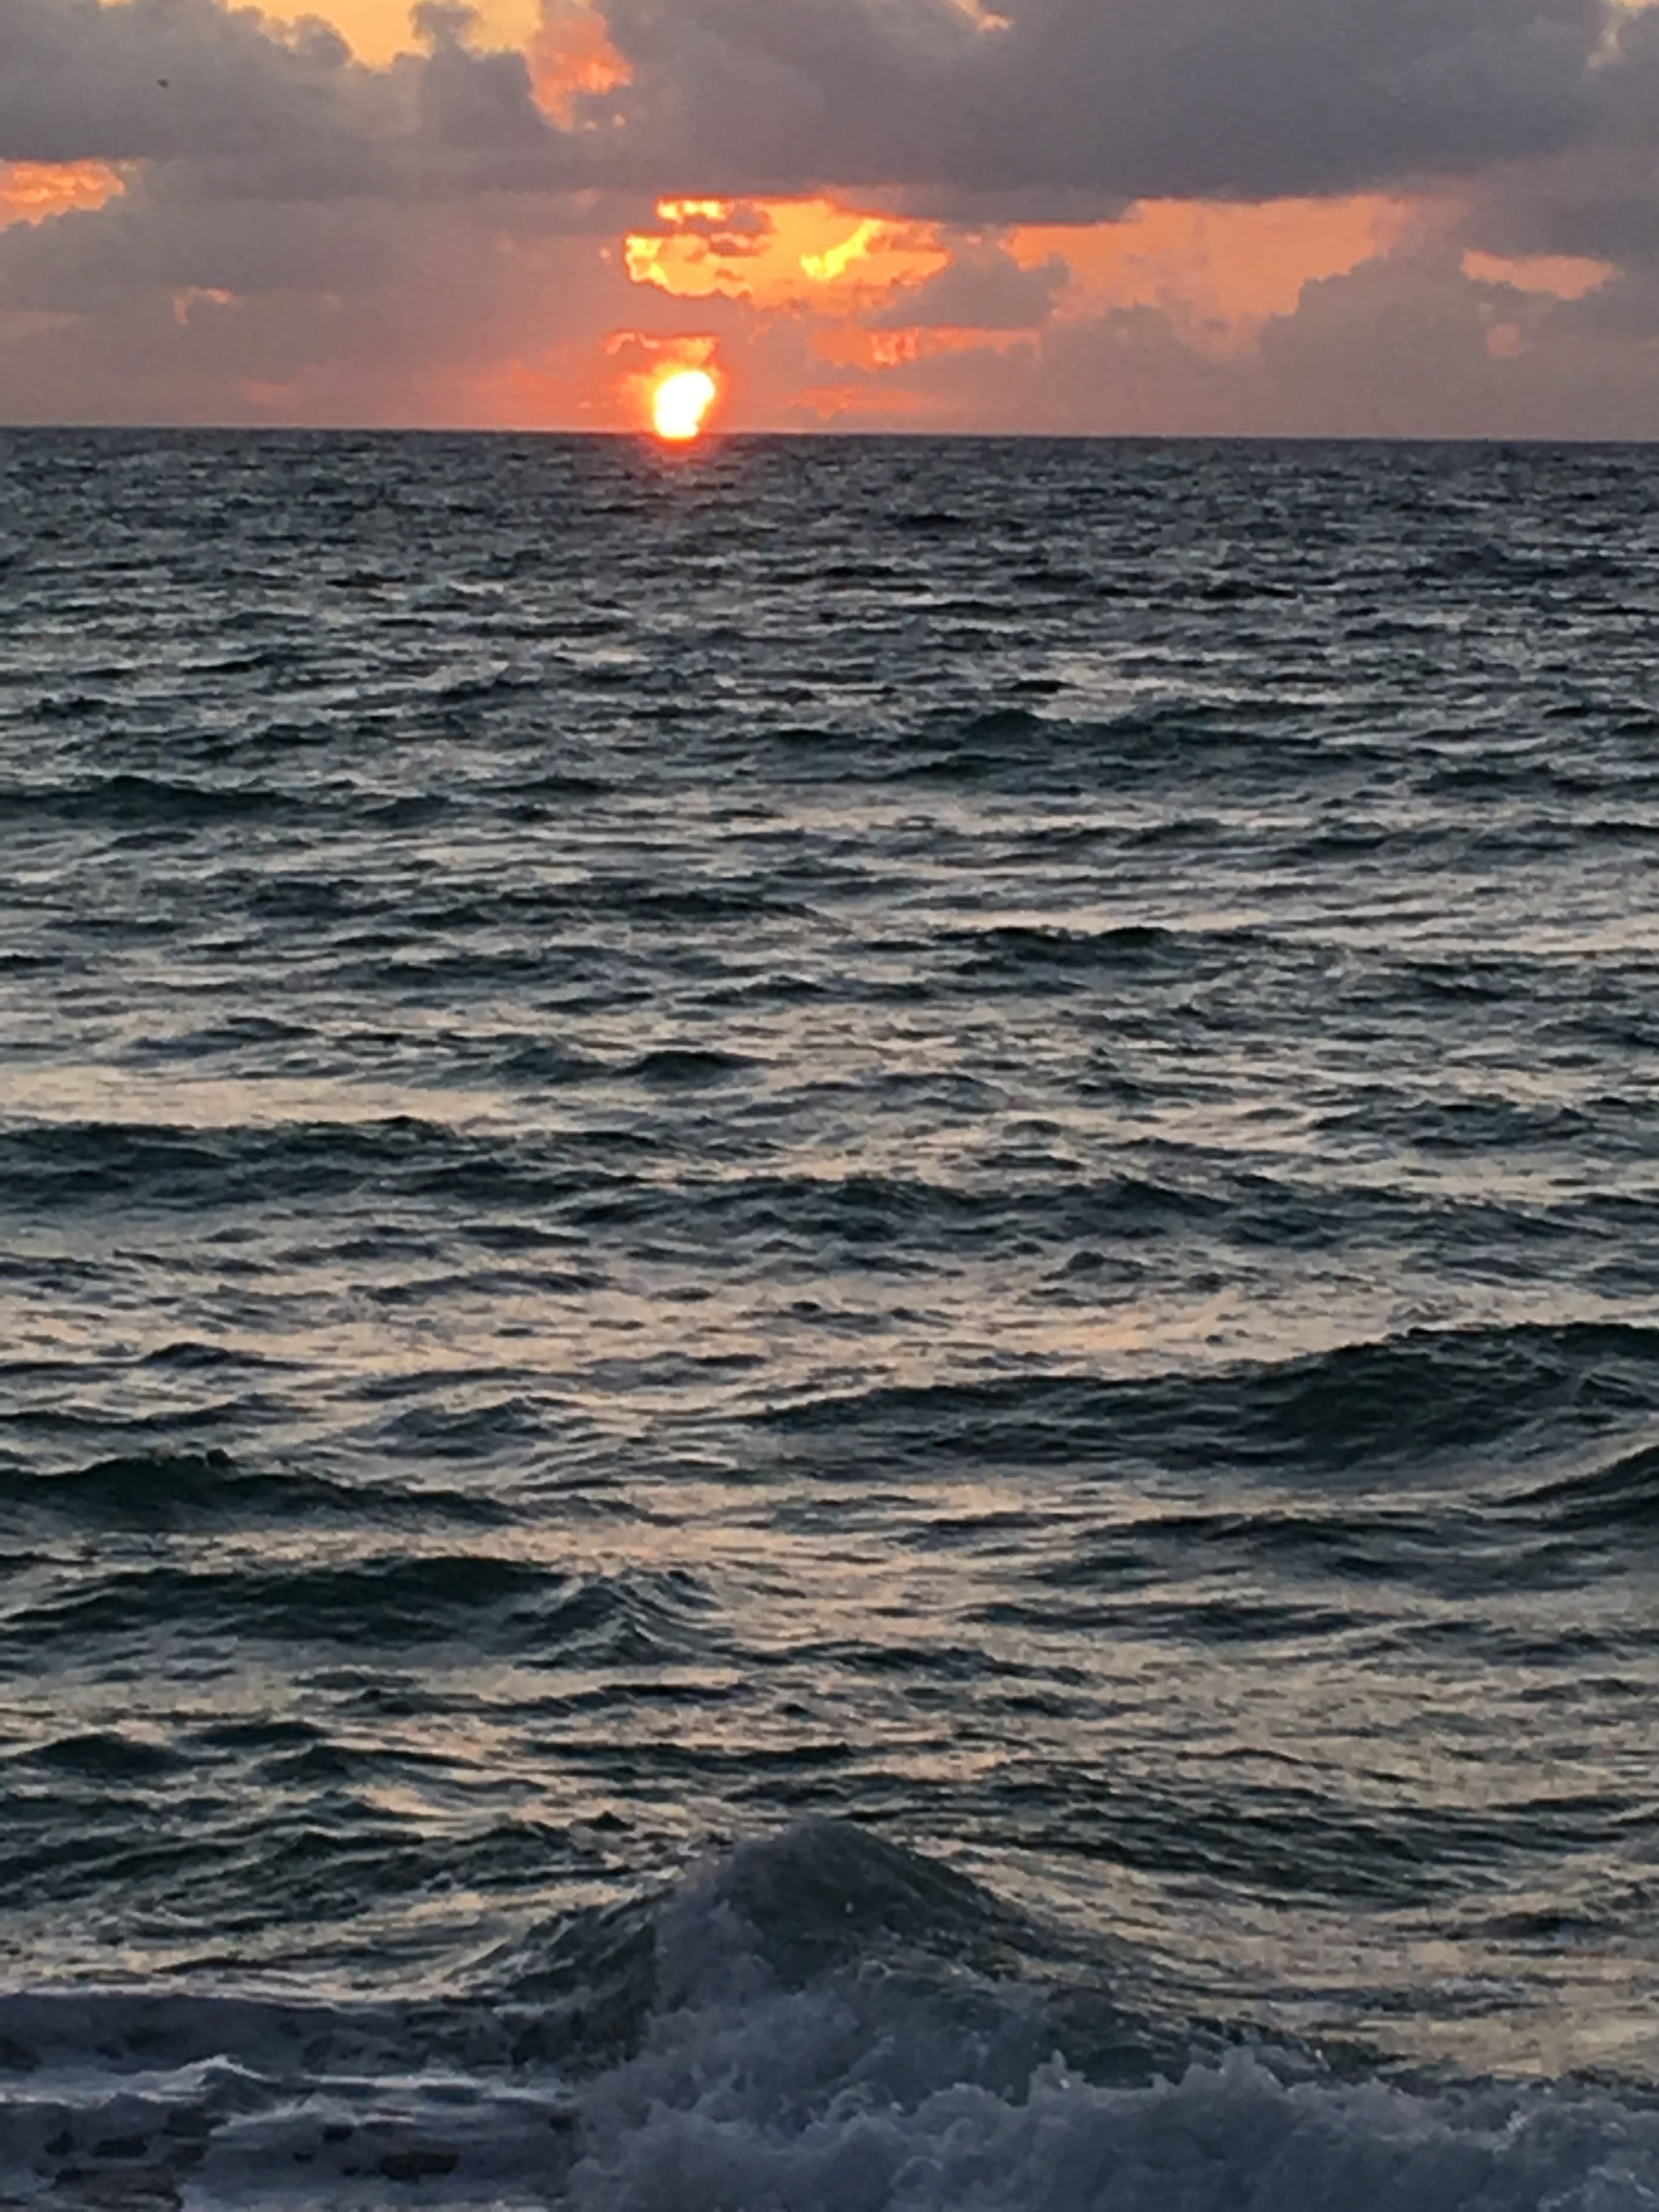 Pin by Emmy J on Sunrise, Sunset! | Sunrise sunset, Sunset ...